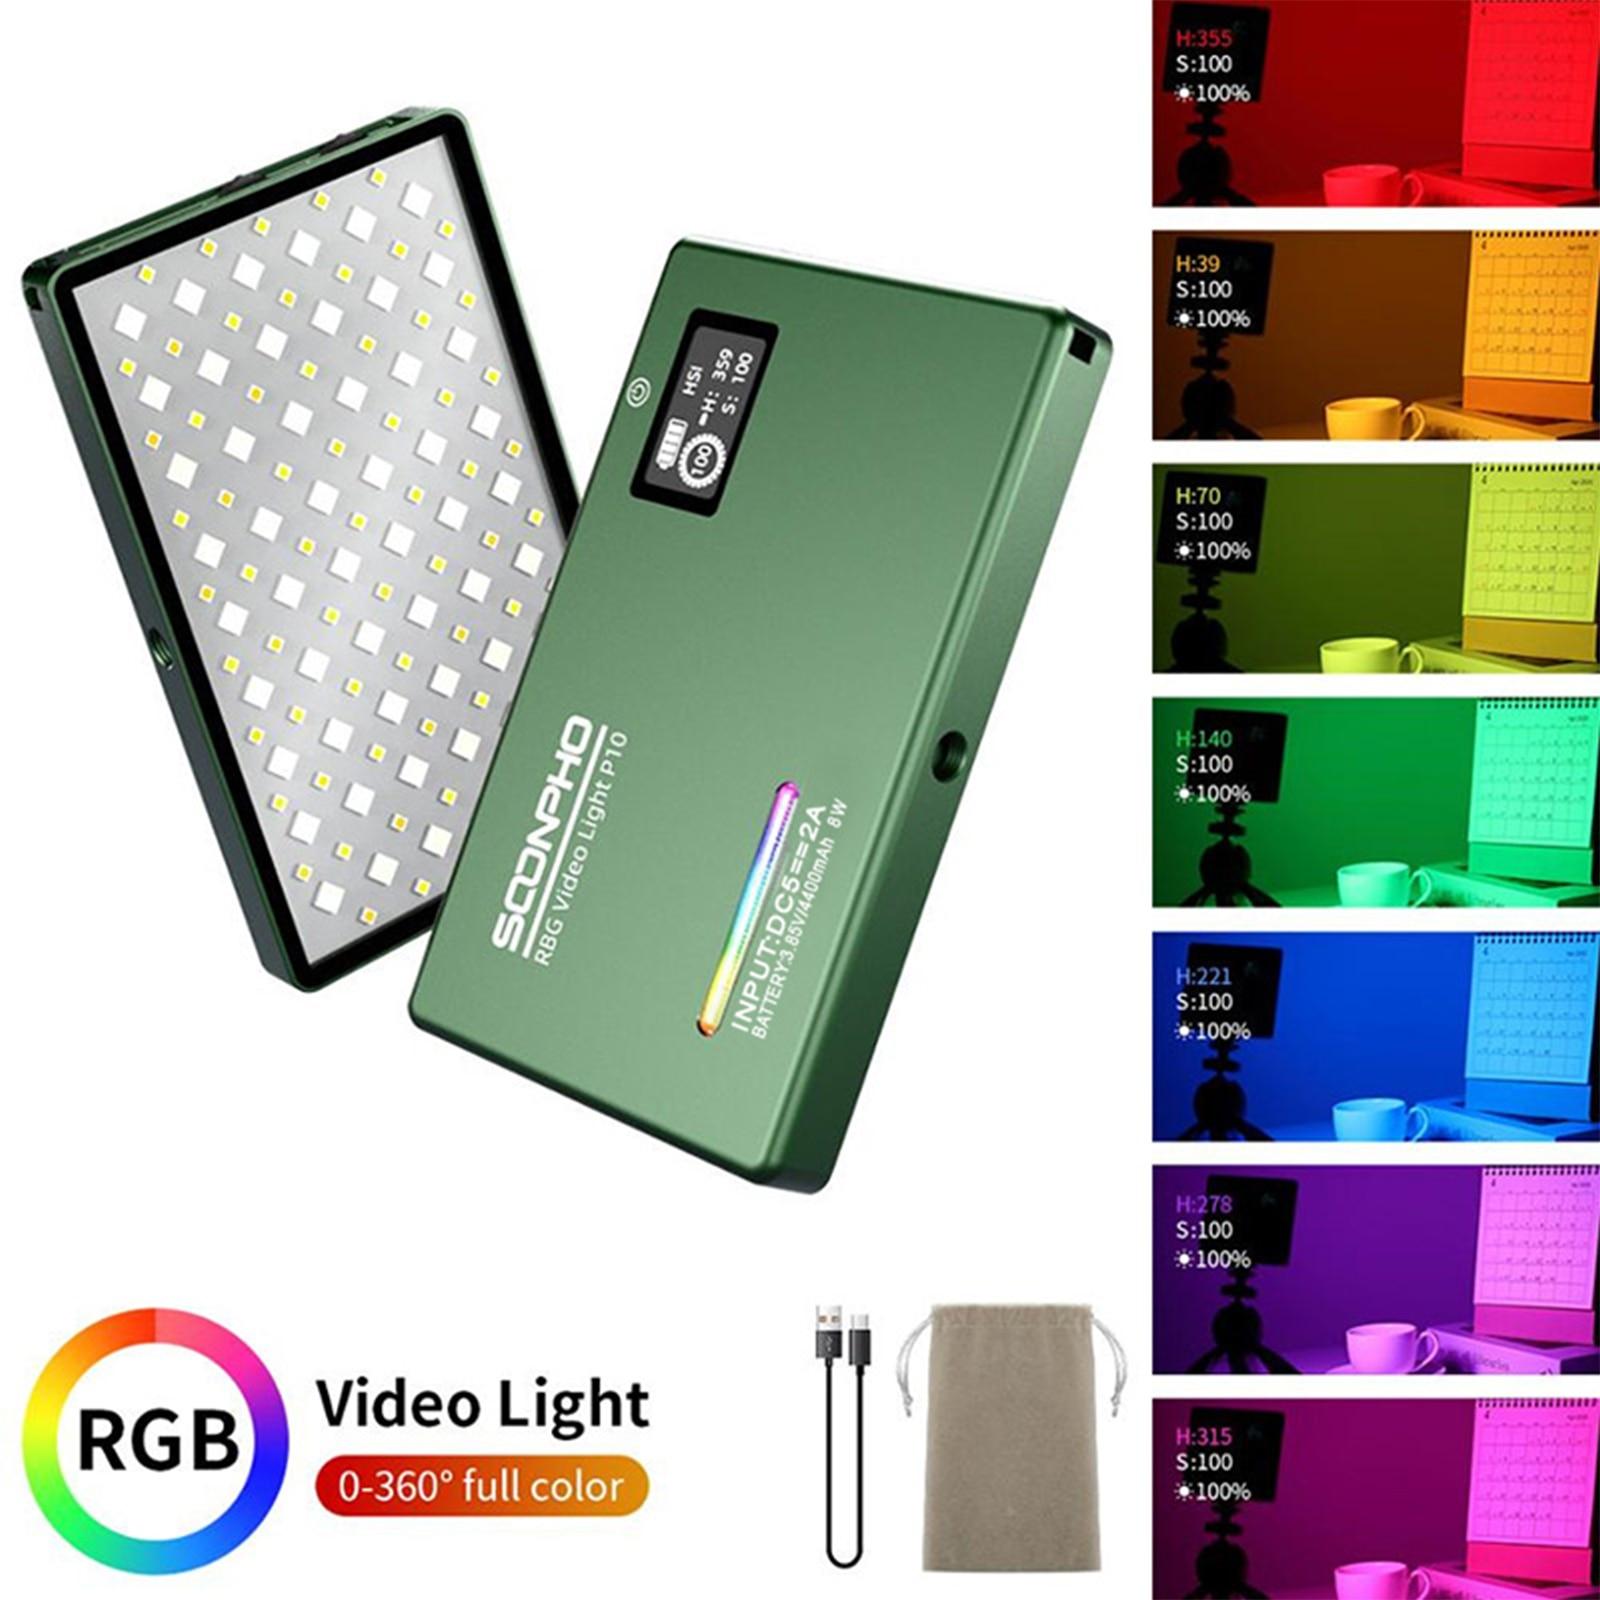 soonpho RGB LED Camera Light Full Color Output Video Light Kit Dimmable 2500K 8500K Bi Color soonpho RGB LED Camera Light Full Color Output Video Light Kit Dimmable 2500K-8500K Bi-Color Panel Light CRI 95+